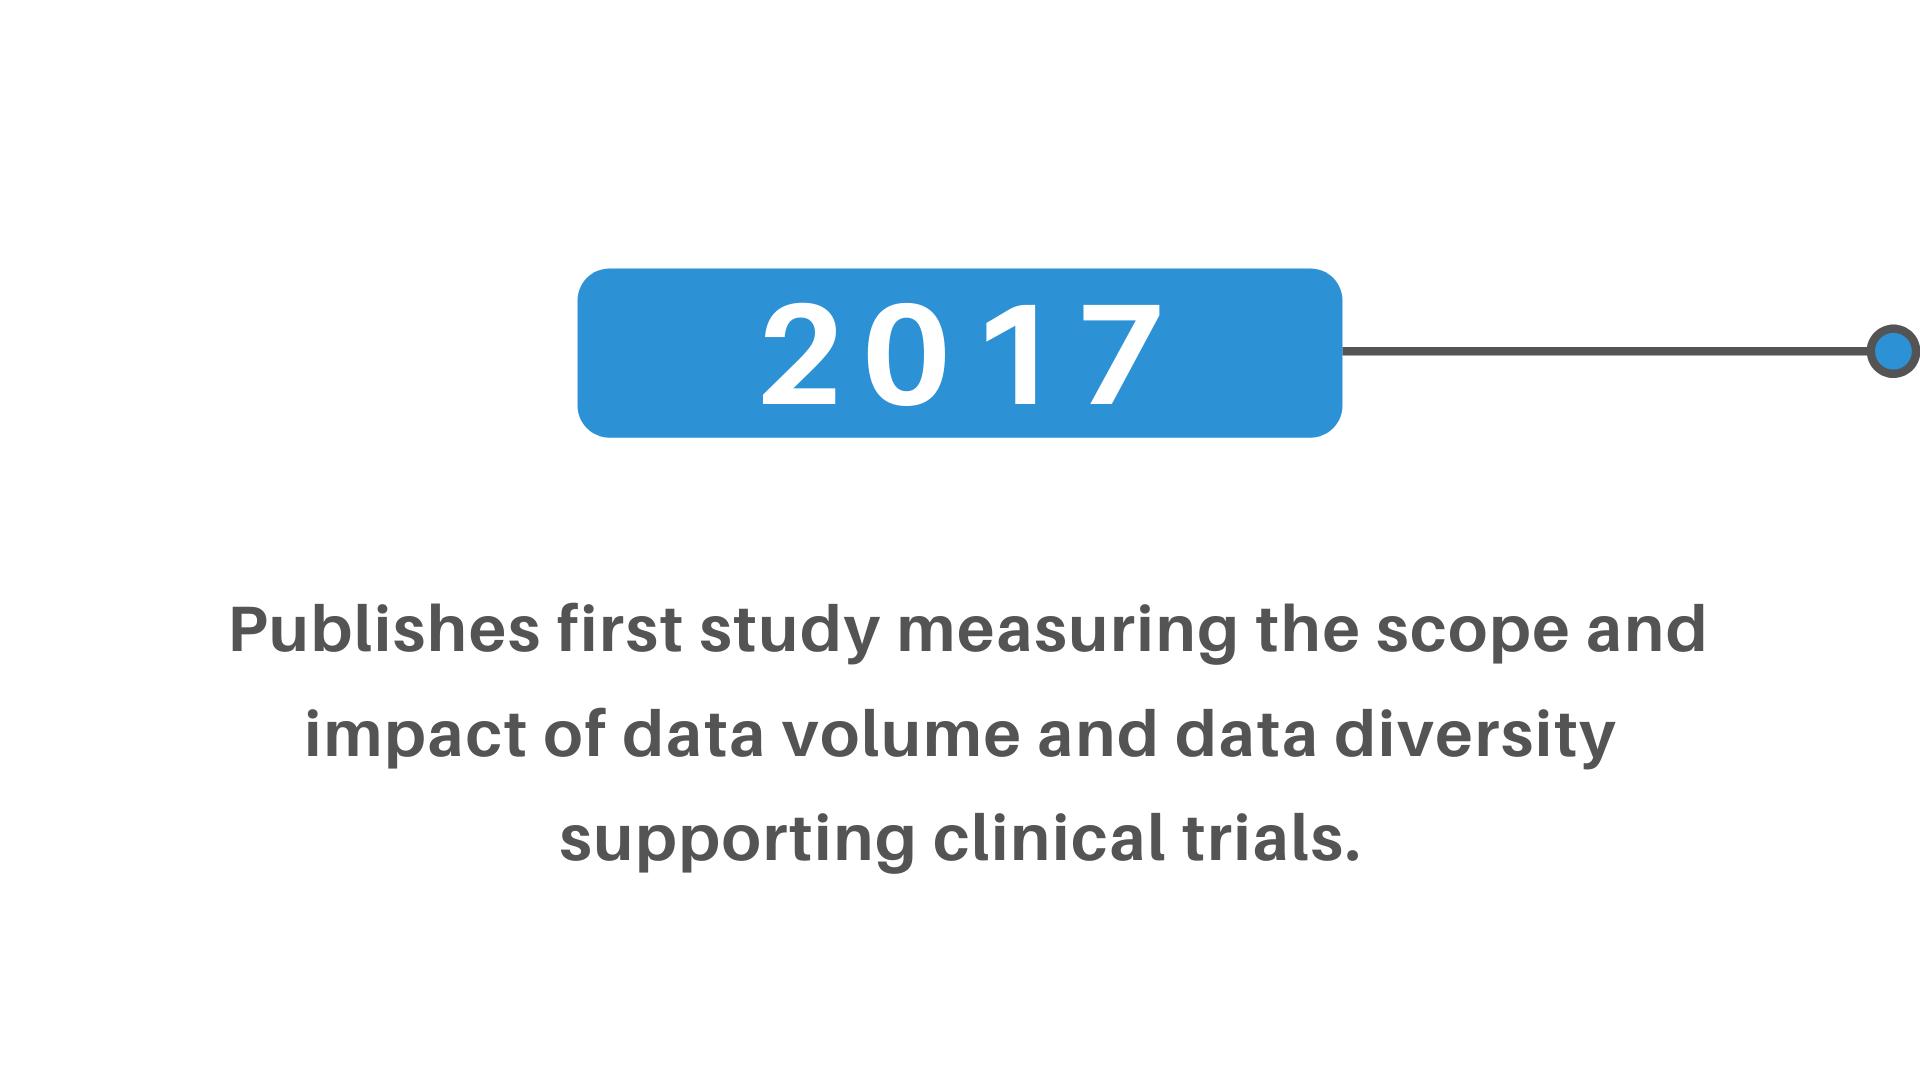 data volume data diversity clinical trials